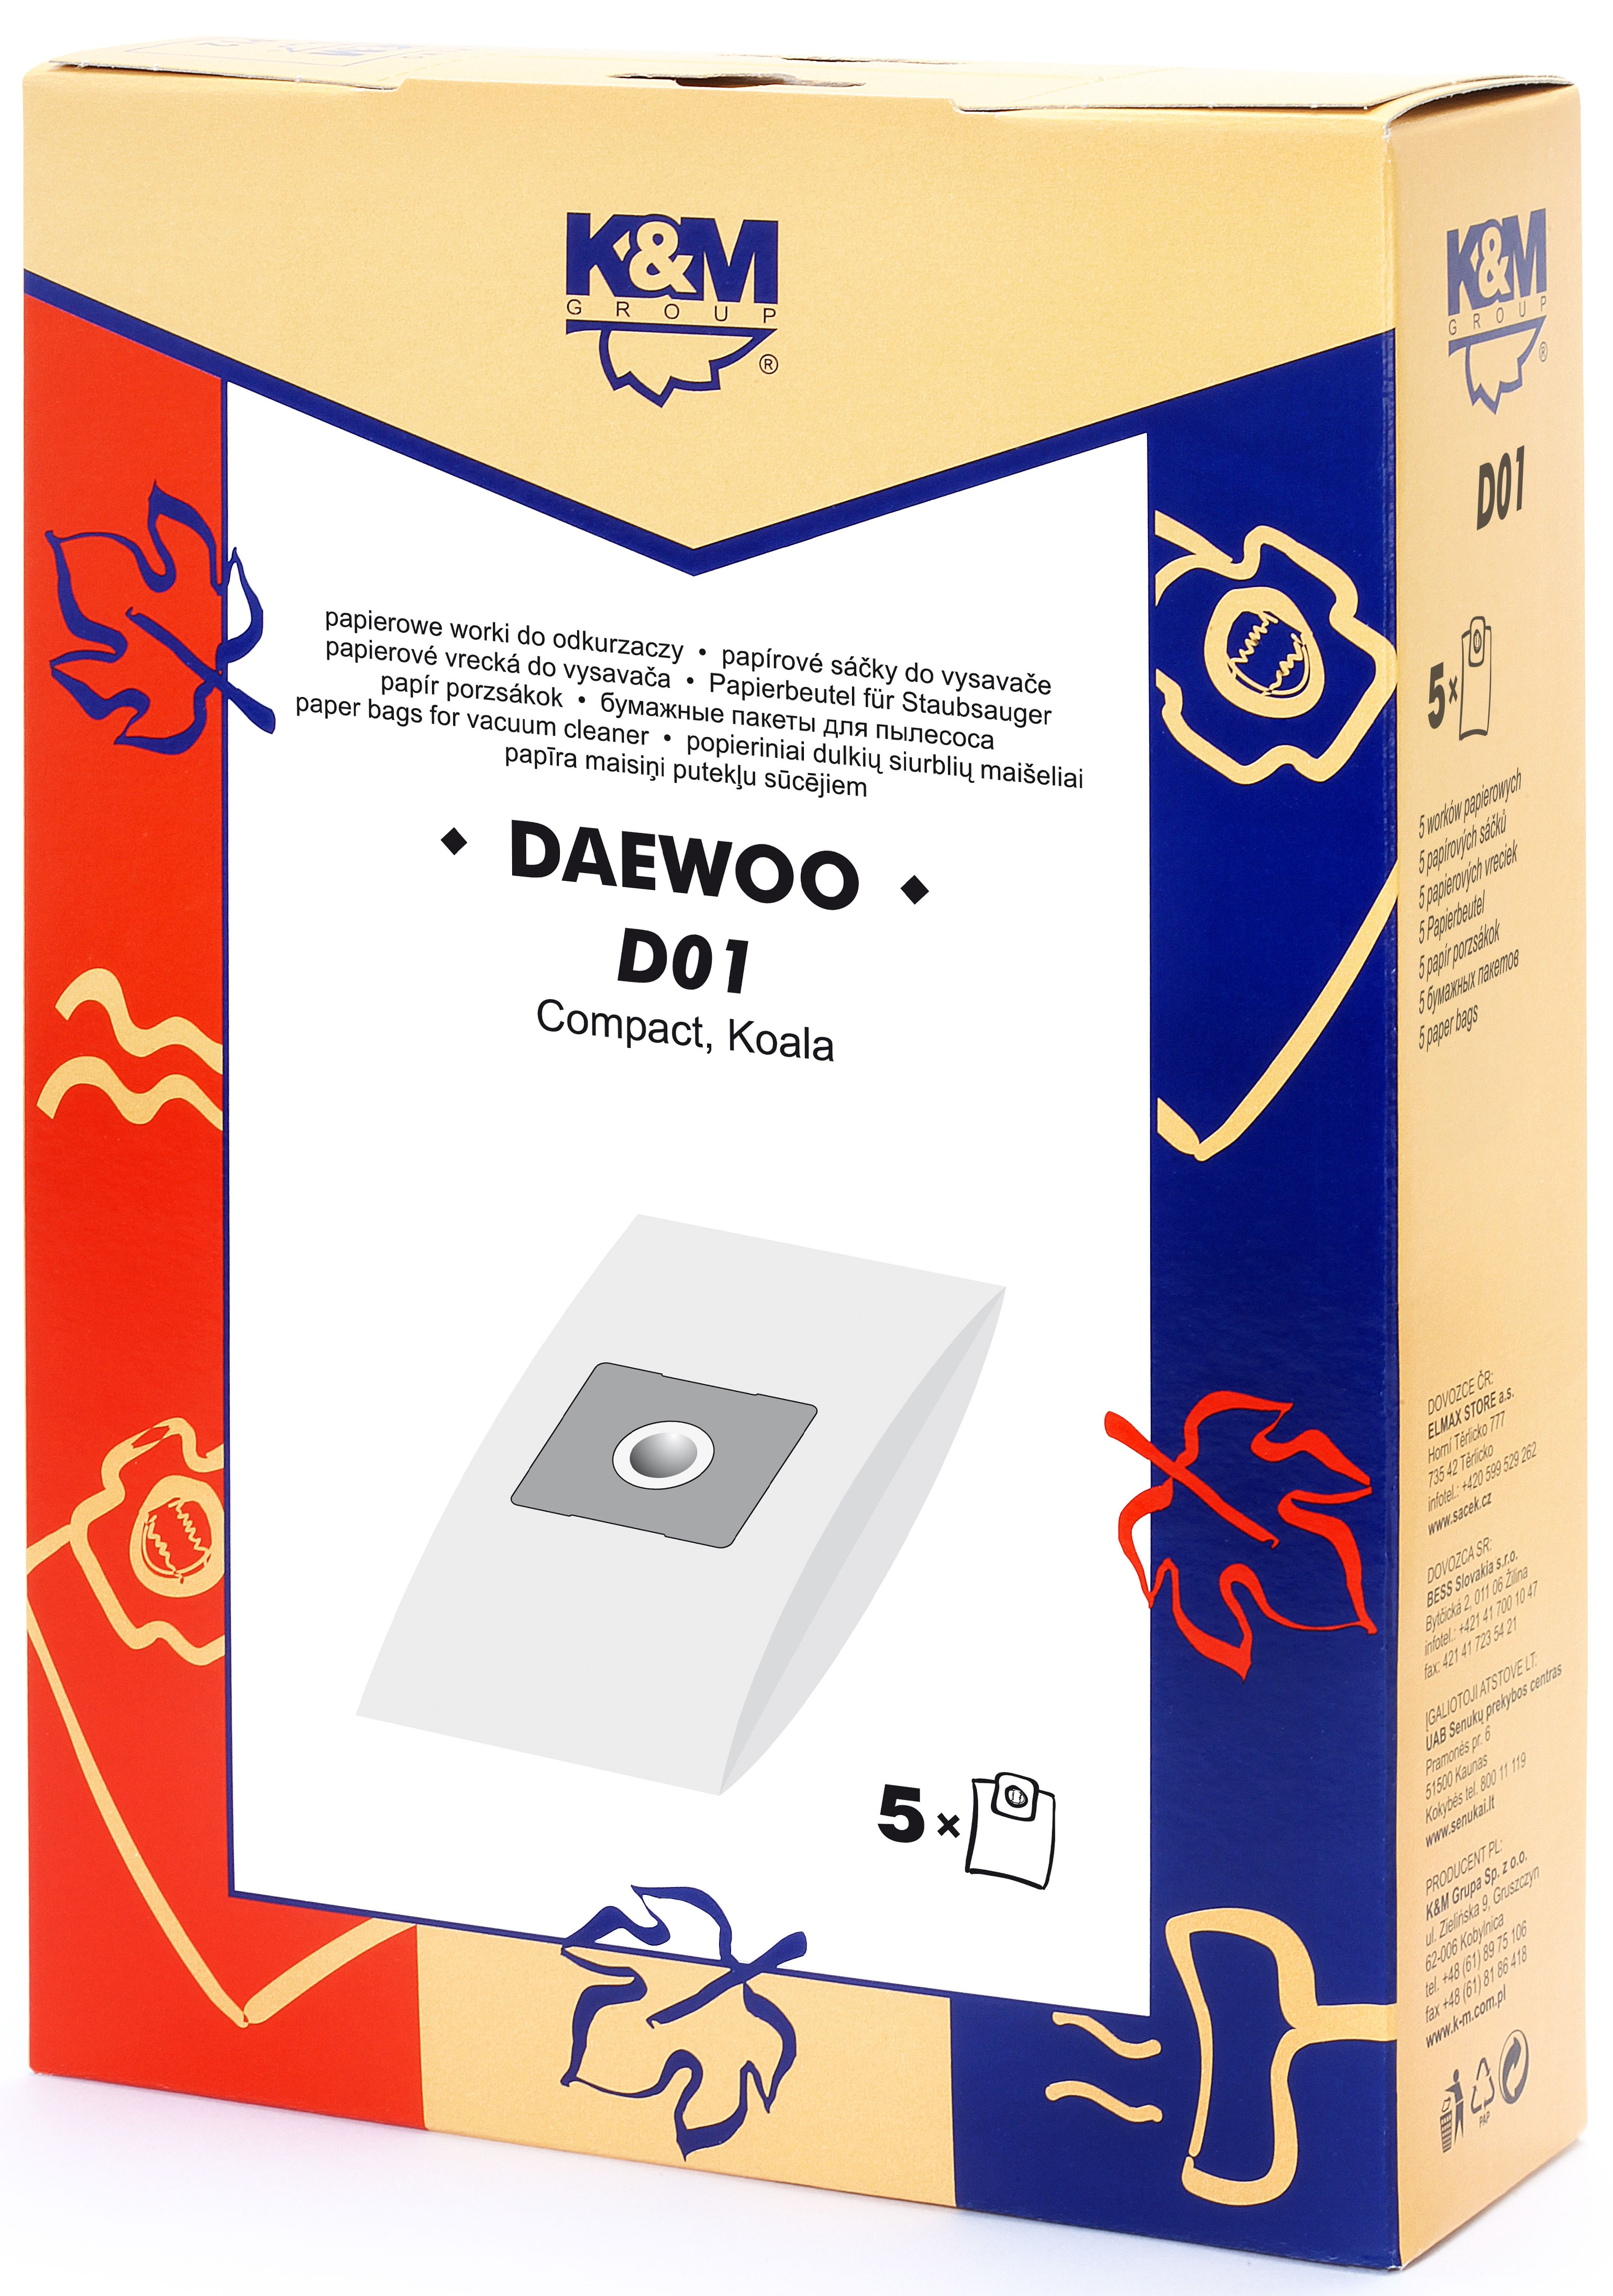 Sac aspirator DAEWOO RC 105/407/705, hartie, 5X saci, K&M [0]